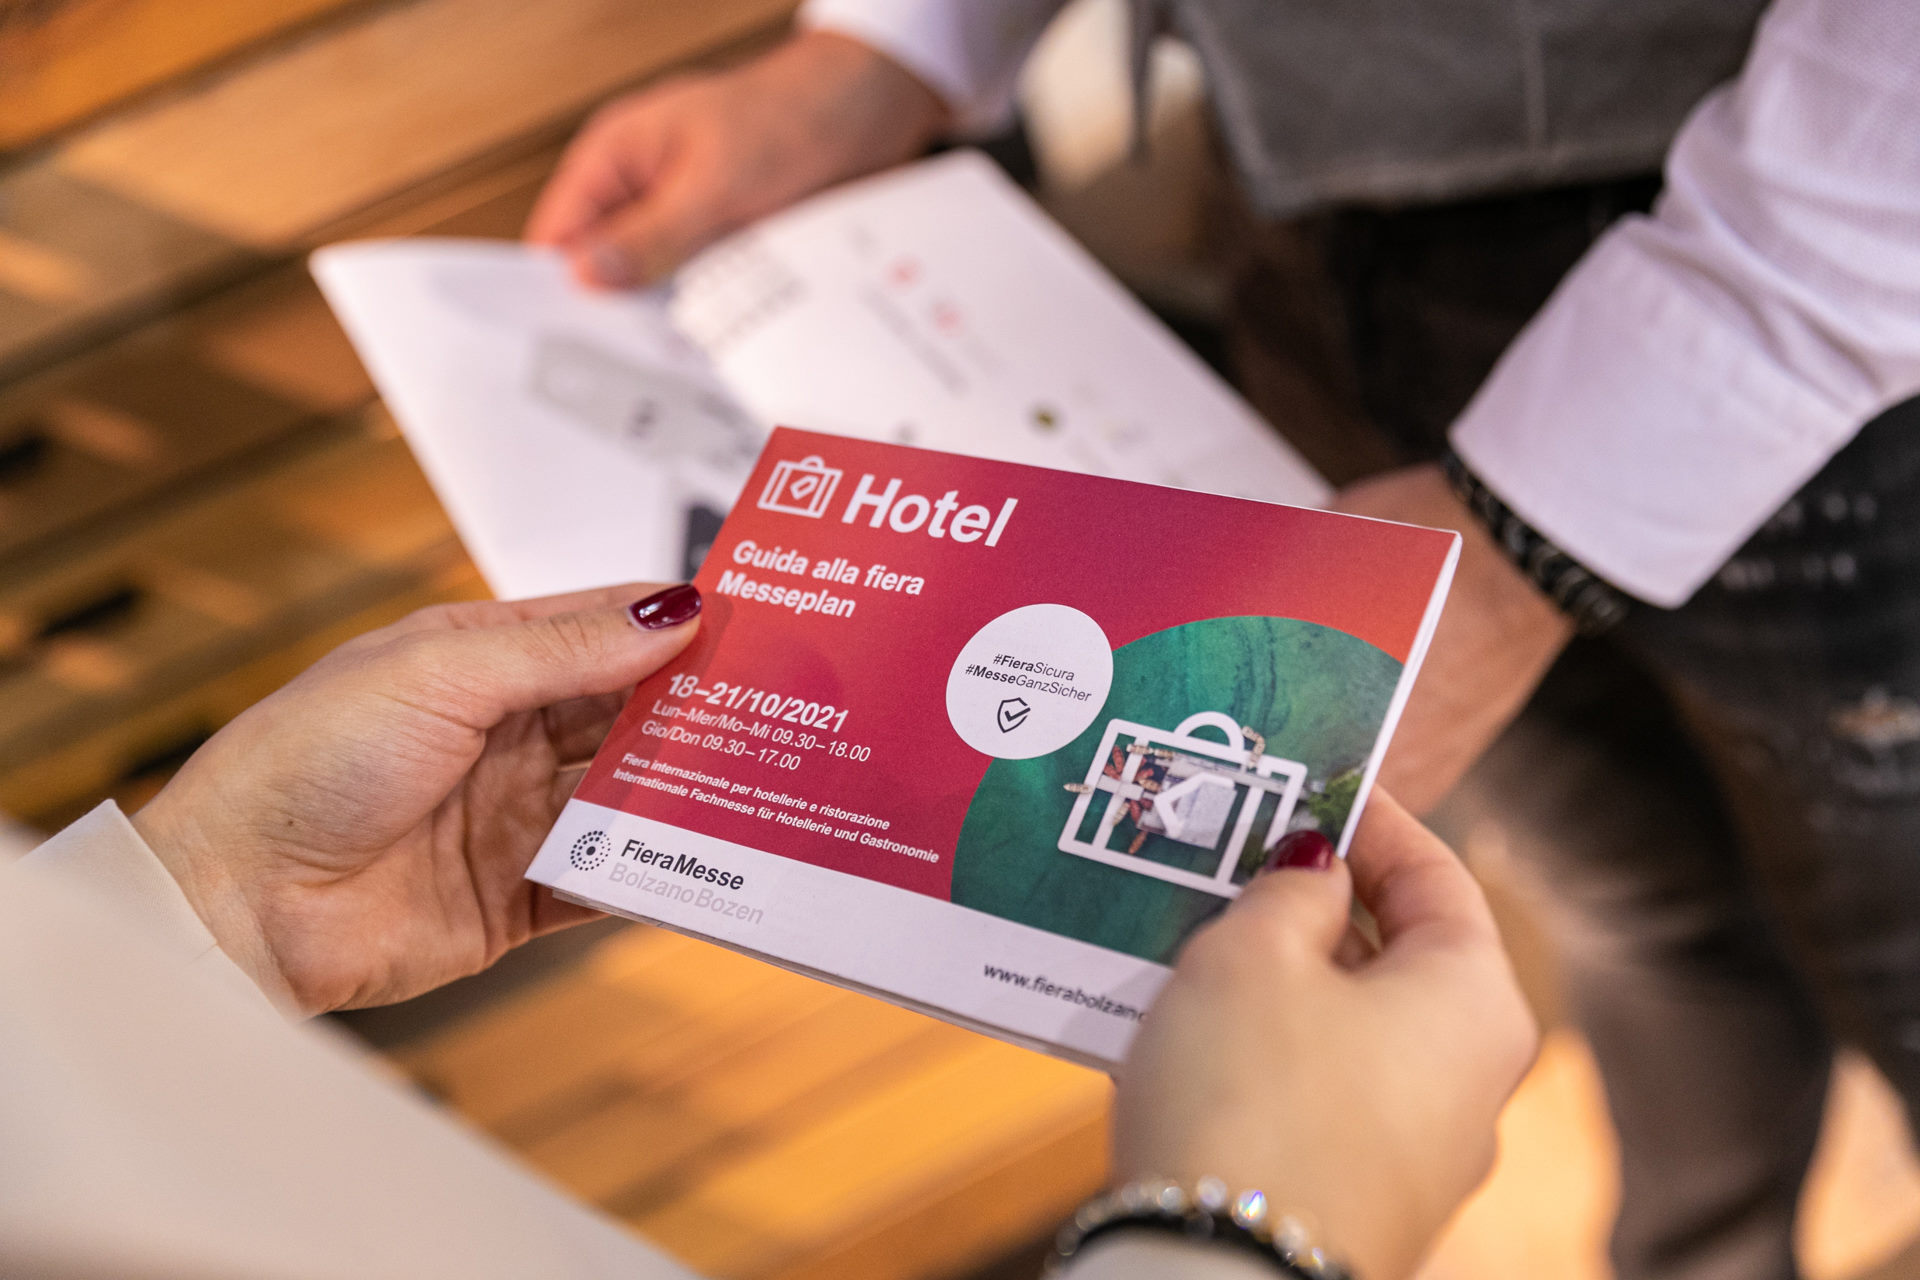 Innovation, Circle, Design, Pioneers: le parole chiave di Hotel 2021